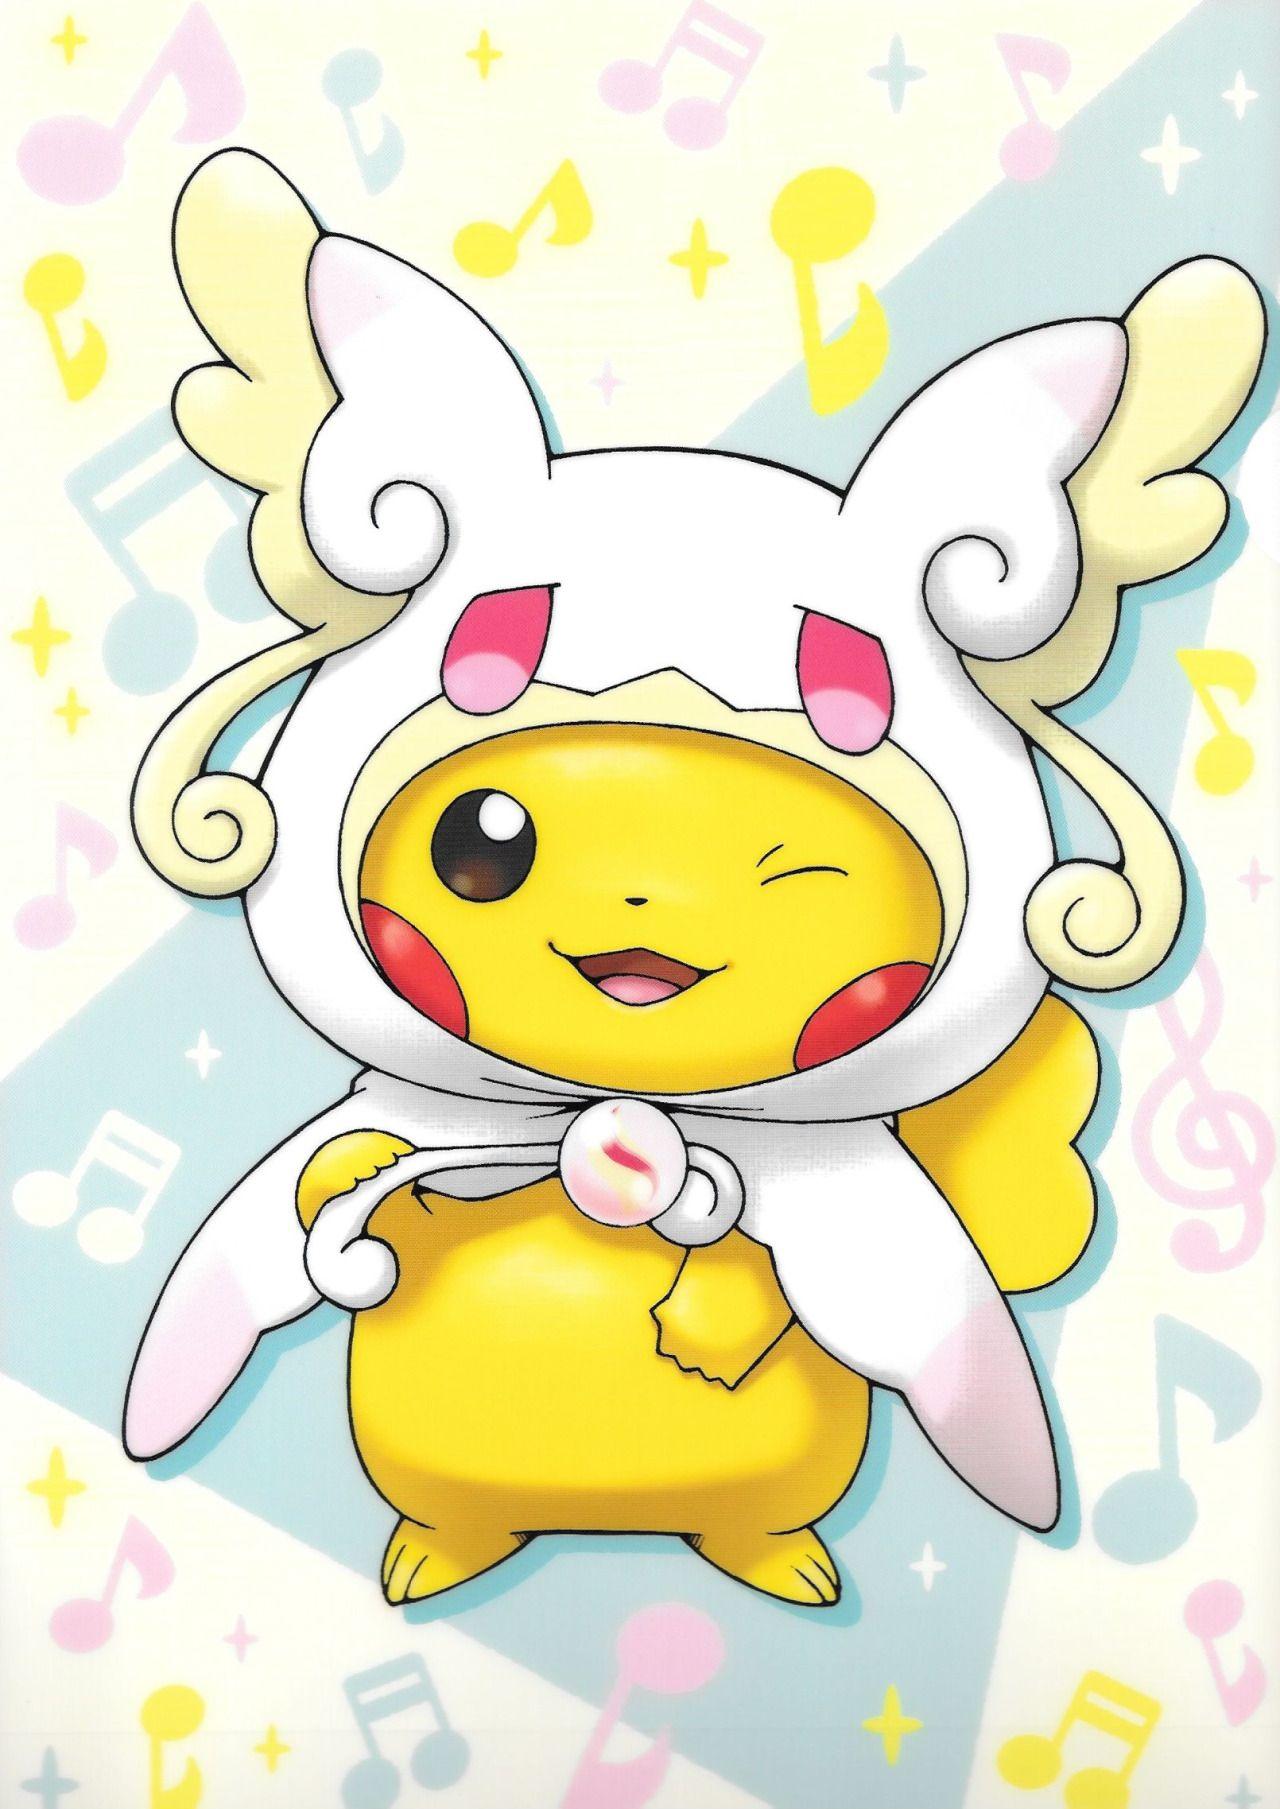 Pikachu mega audino pok mon pikachu pokemon snorlax - Pikachu dessin anime ...